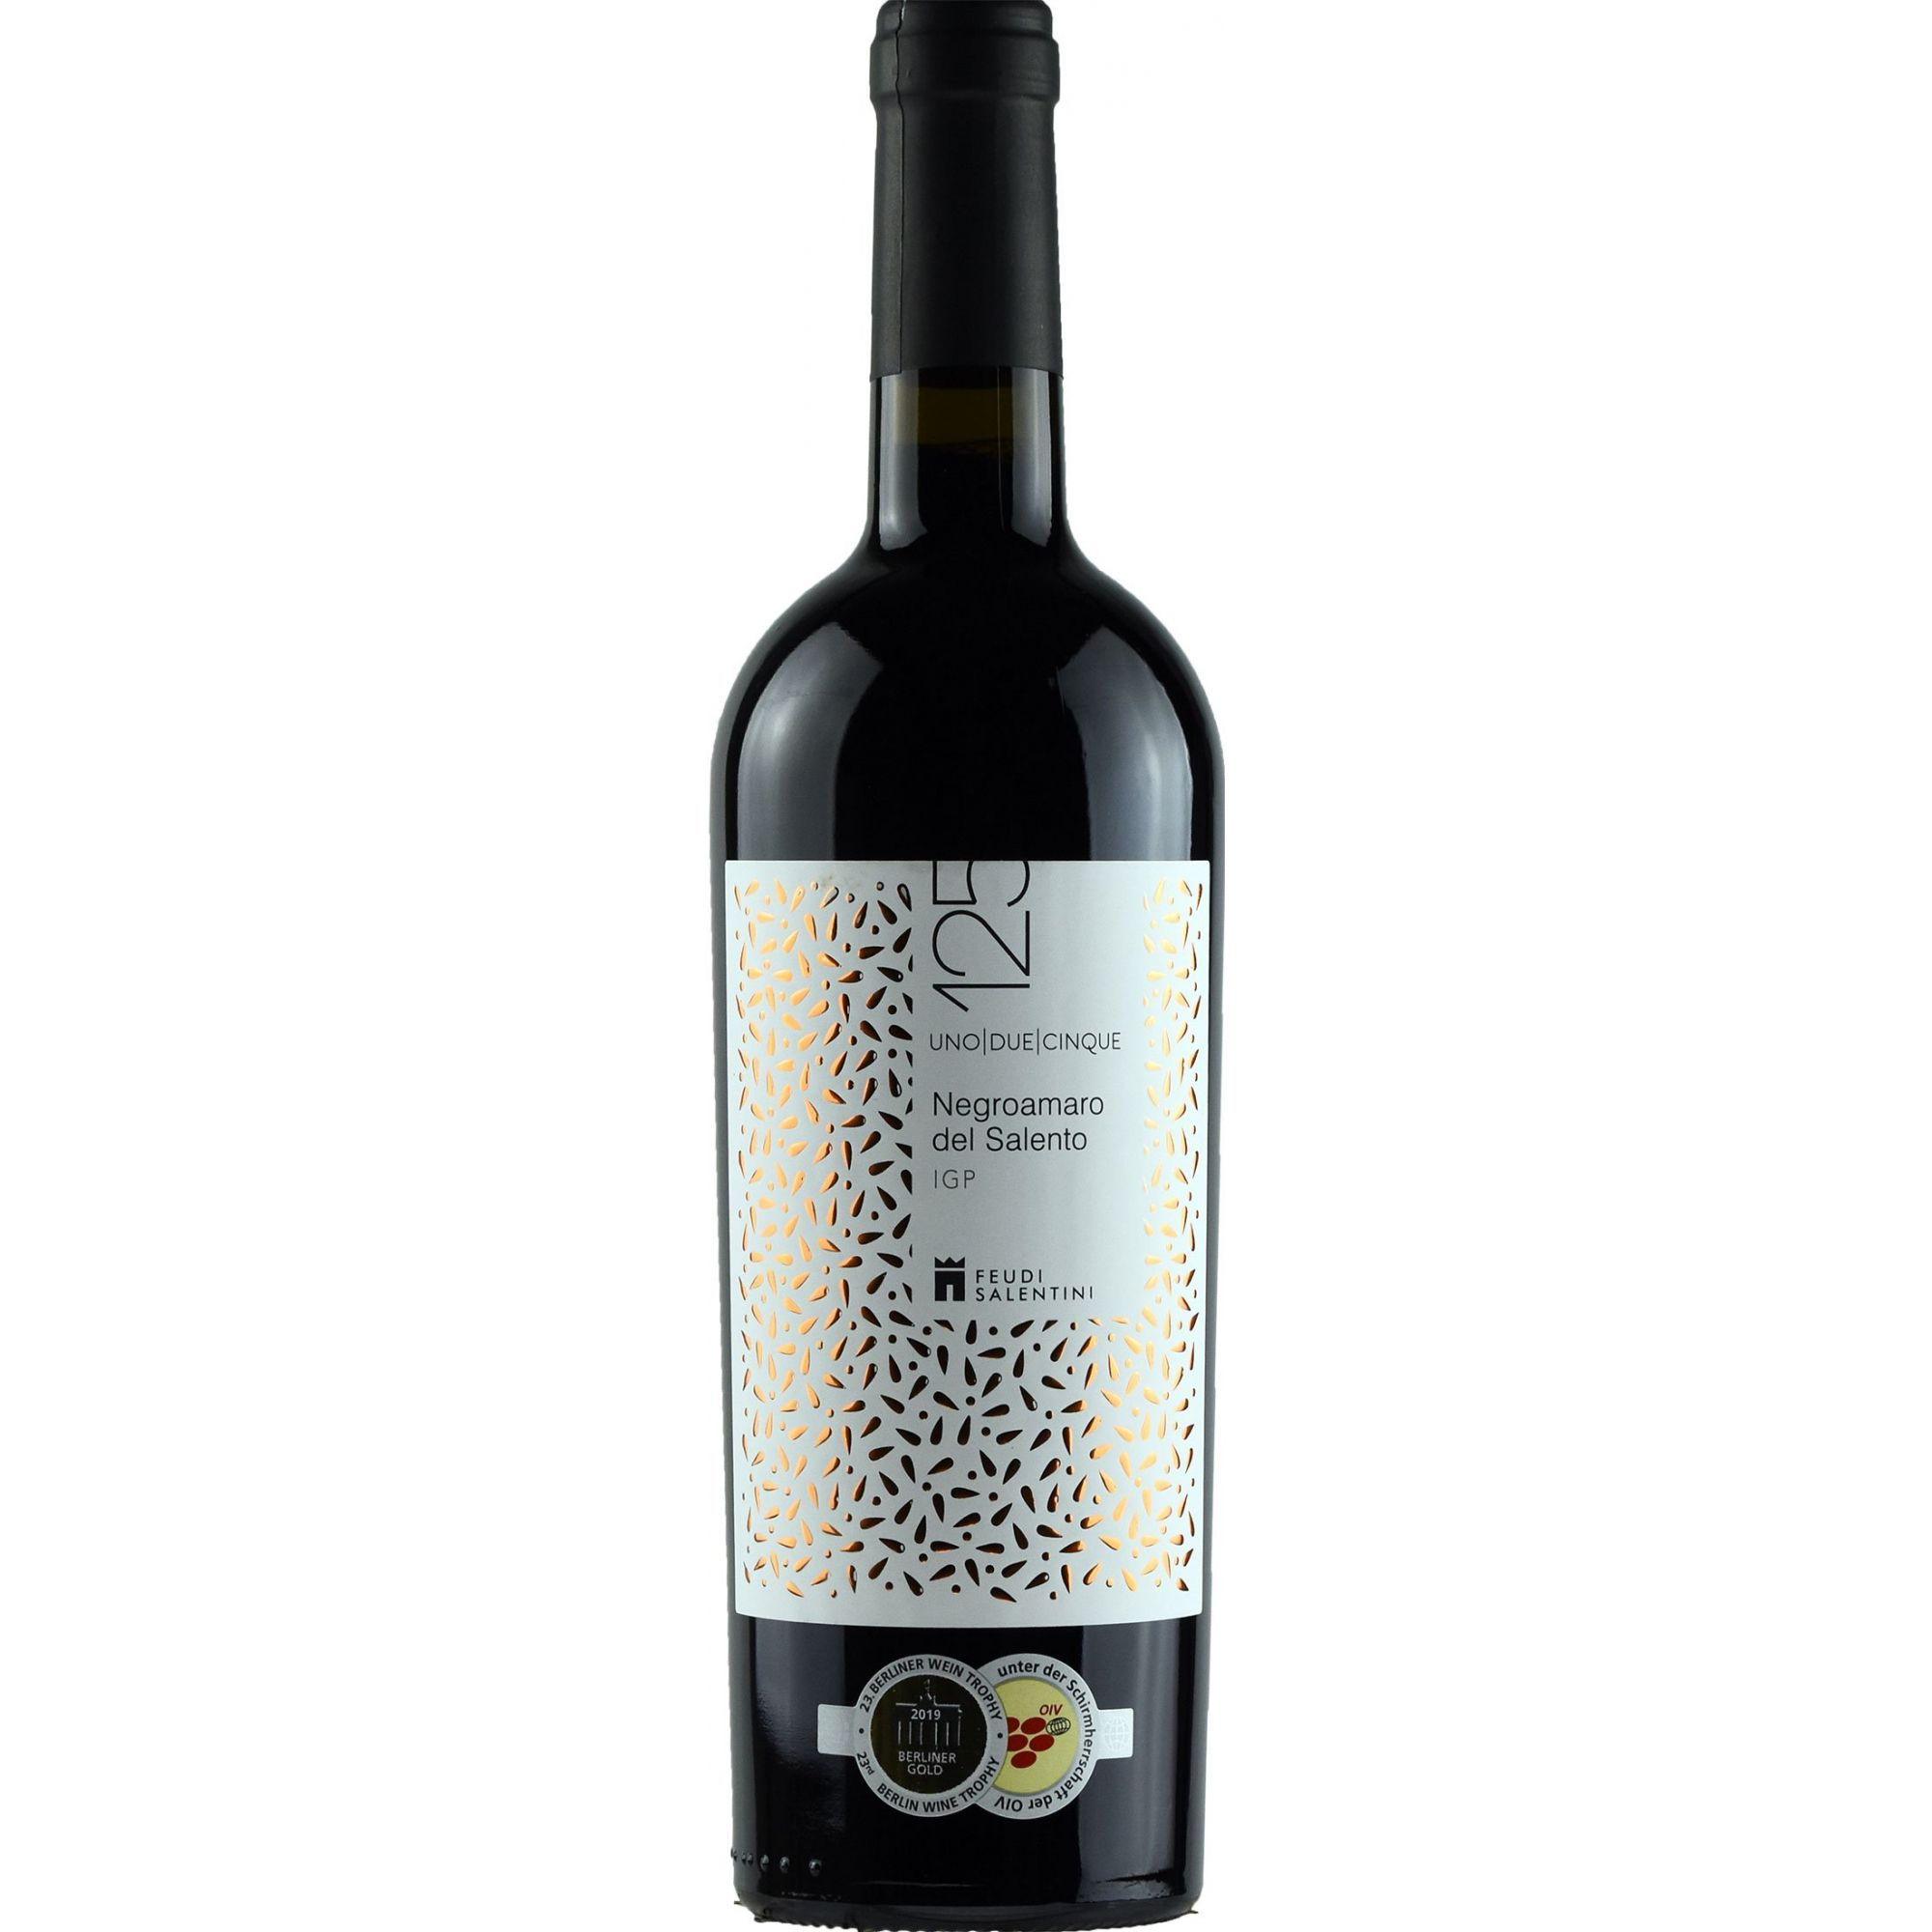 Vinho 125 Gocce Negroamaro del Salento 2018